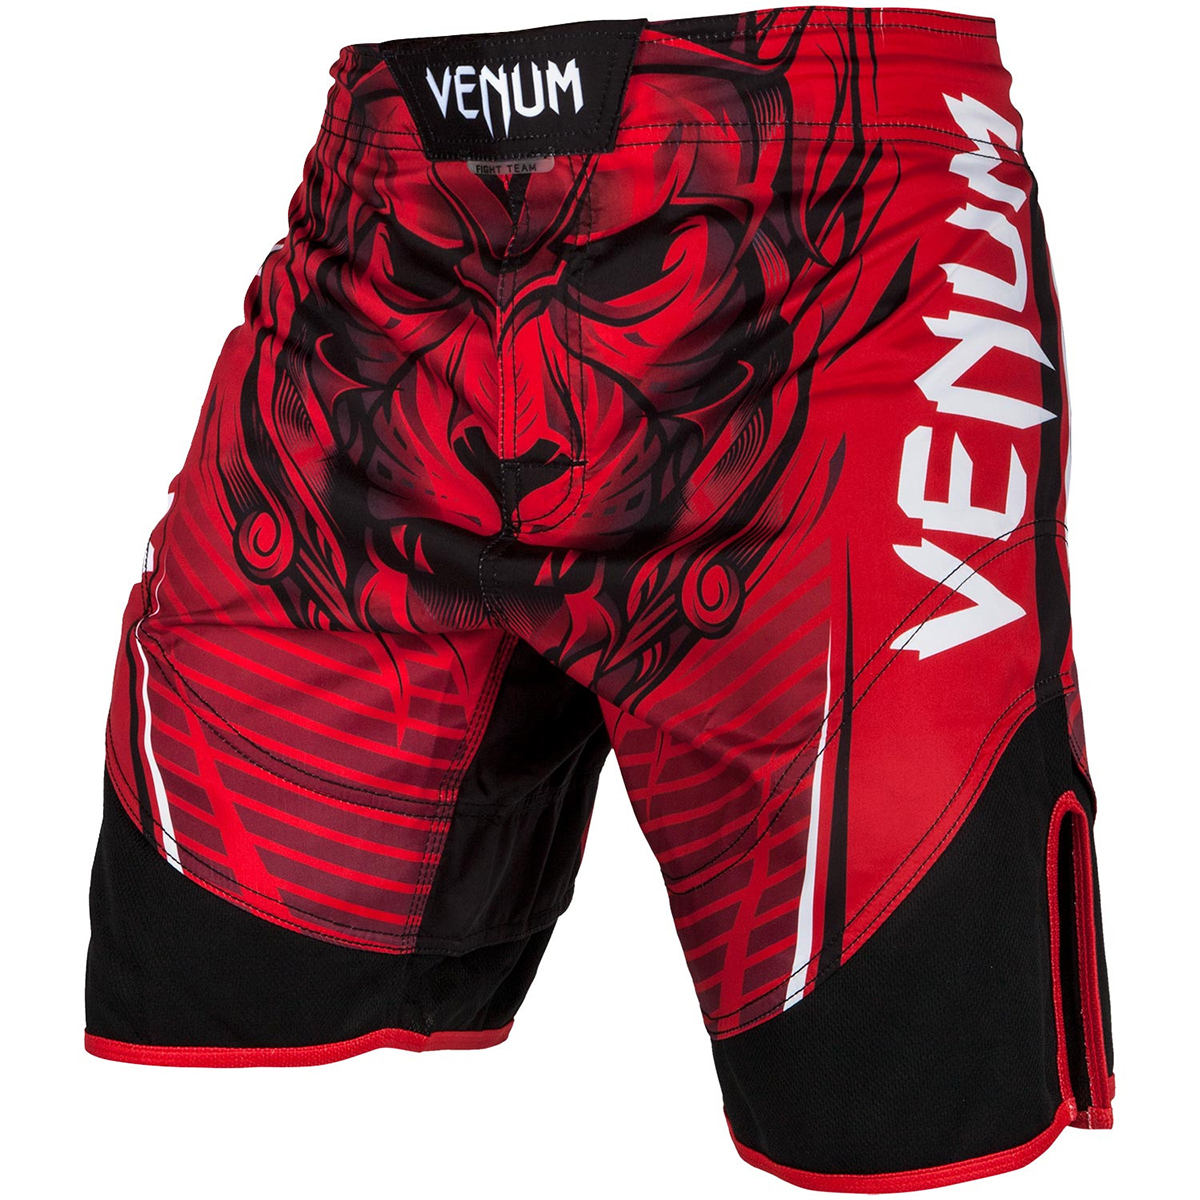 Venum Bloody Roar Lightweight MMA Fight Shorts